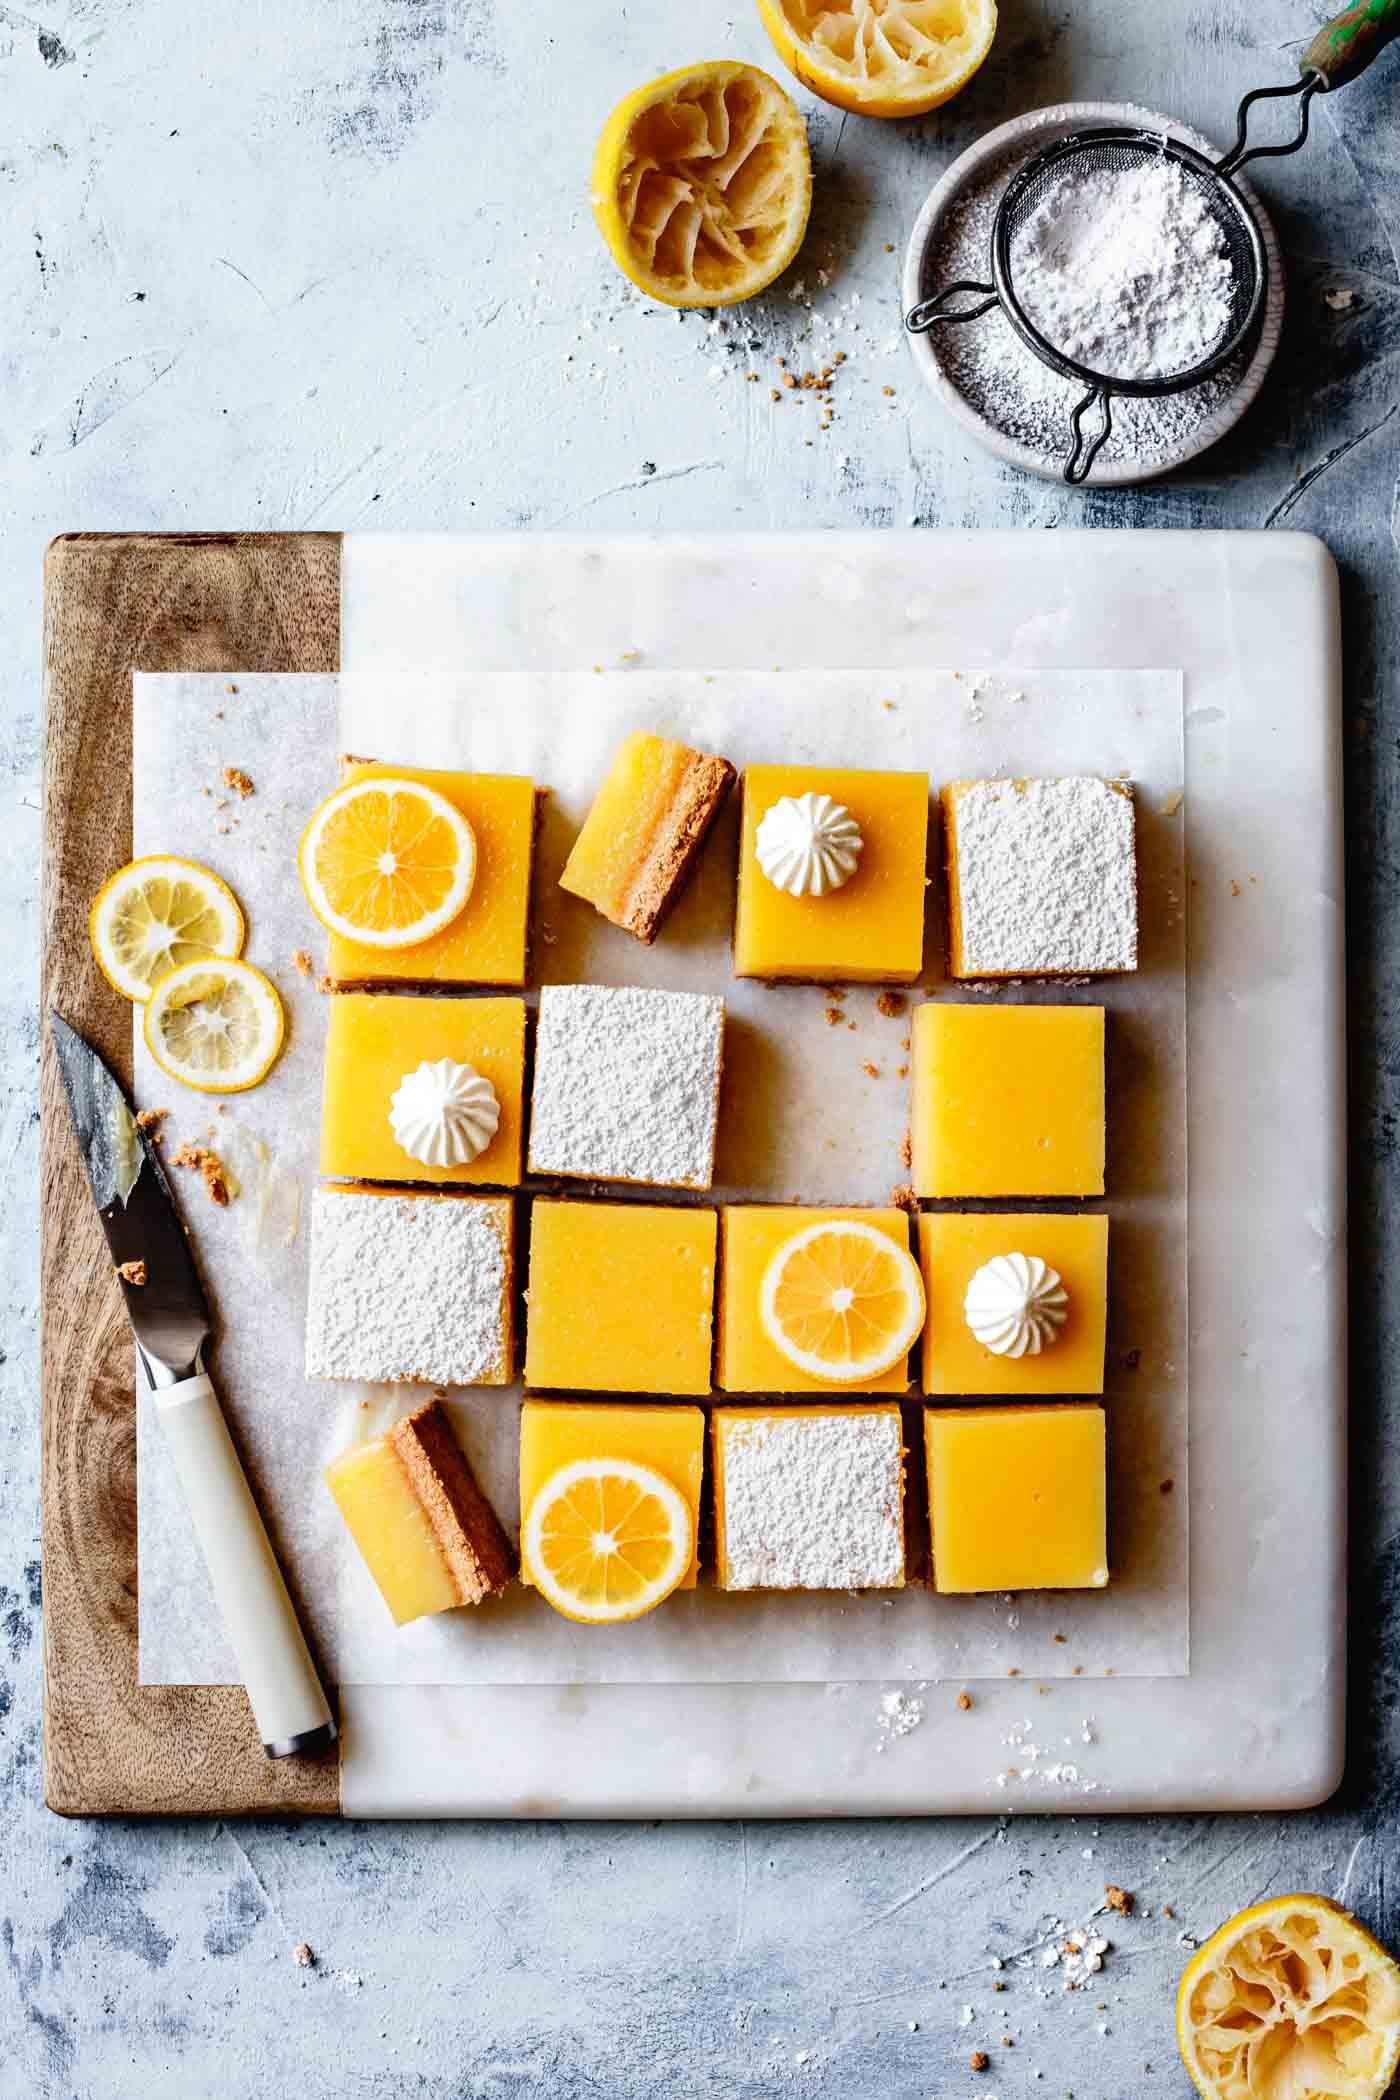 Gluten-free lemon tart or lemon bars recipe, decorated on a cutting board